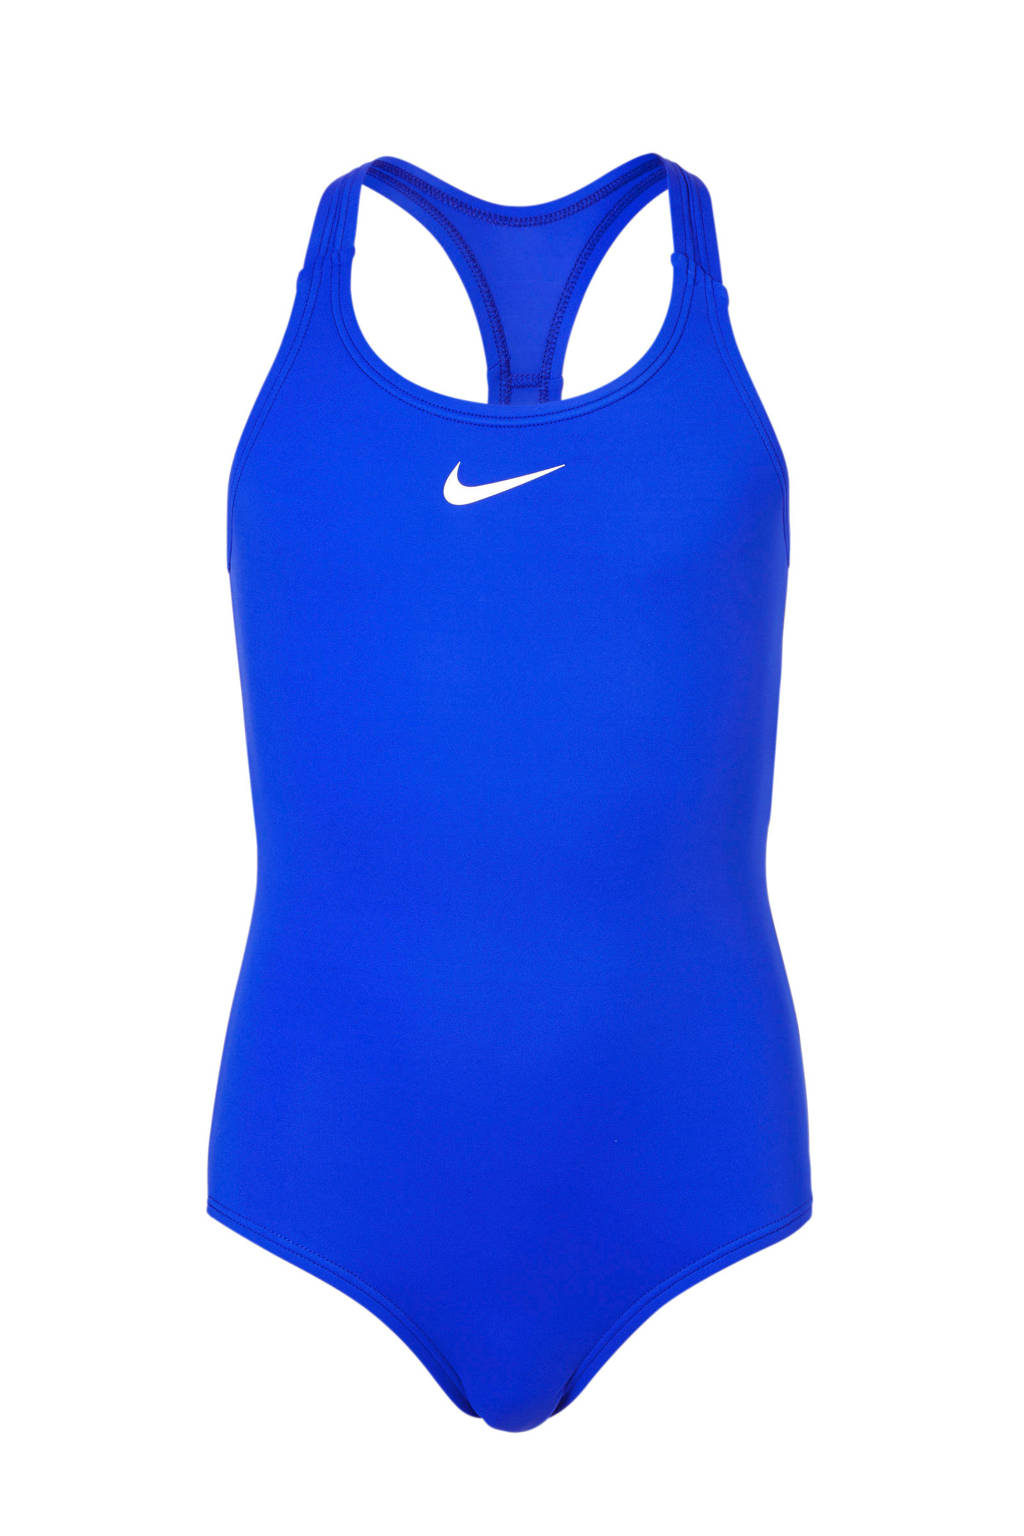 Nike sportbadpak met racerback blauw, Blauw